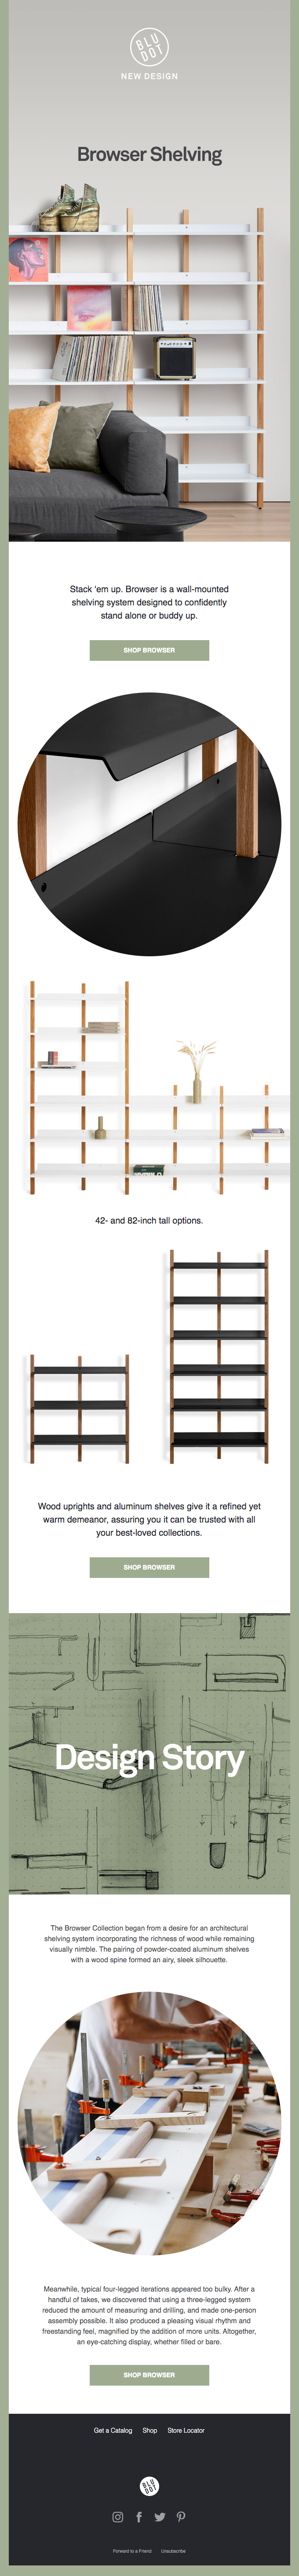 New Design | Browser Shelving